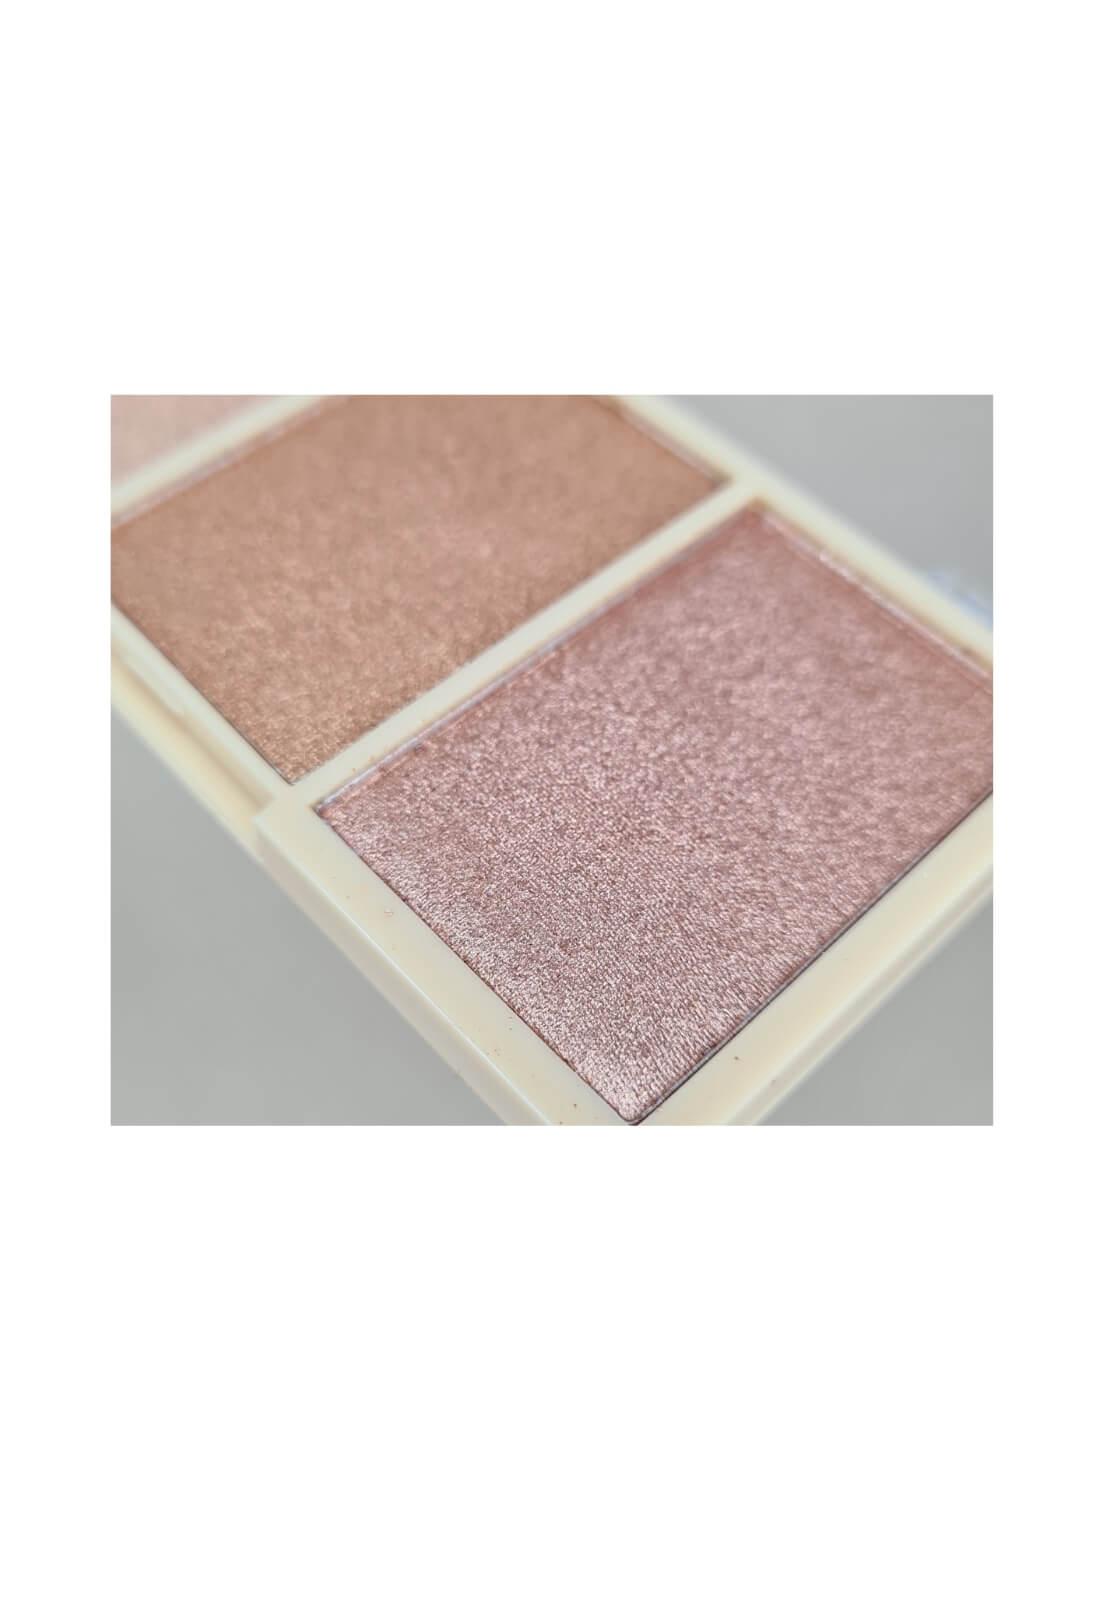 Paleta de iluminador Ruby Rose Glowing mini kit cor 2